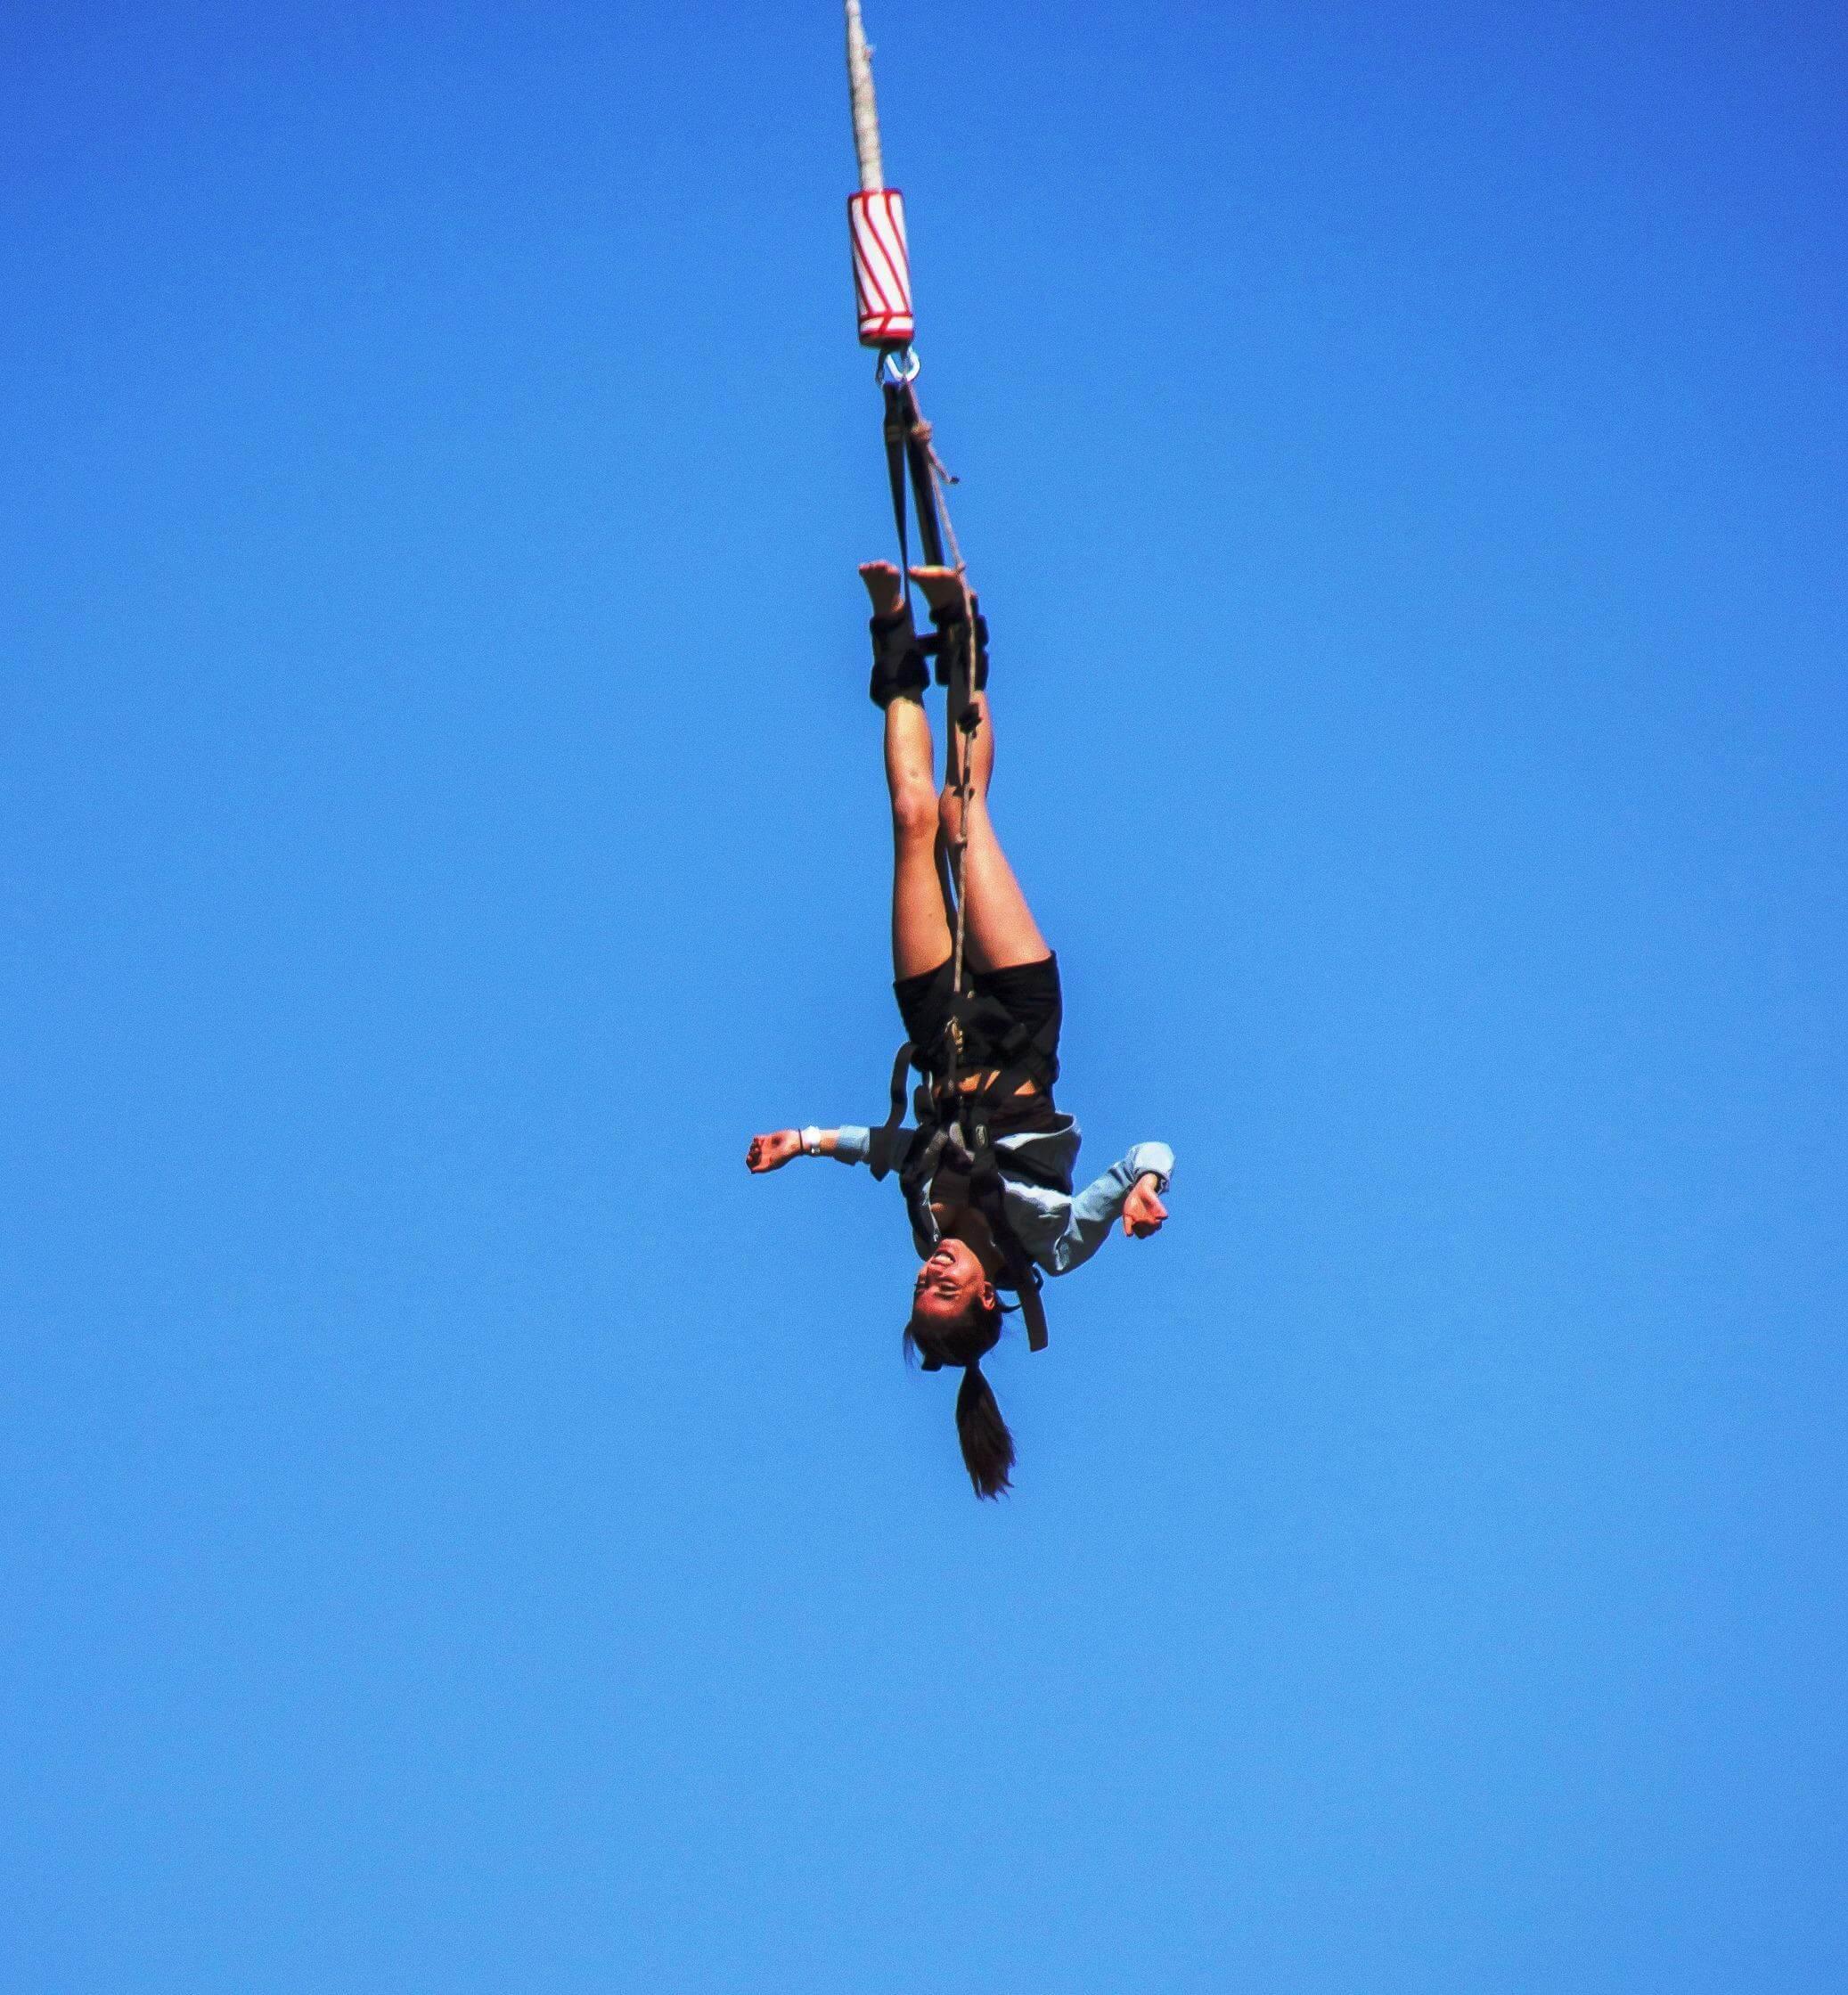 Bunge jumping - Pag island